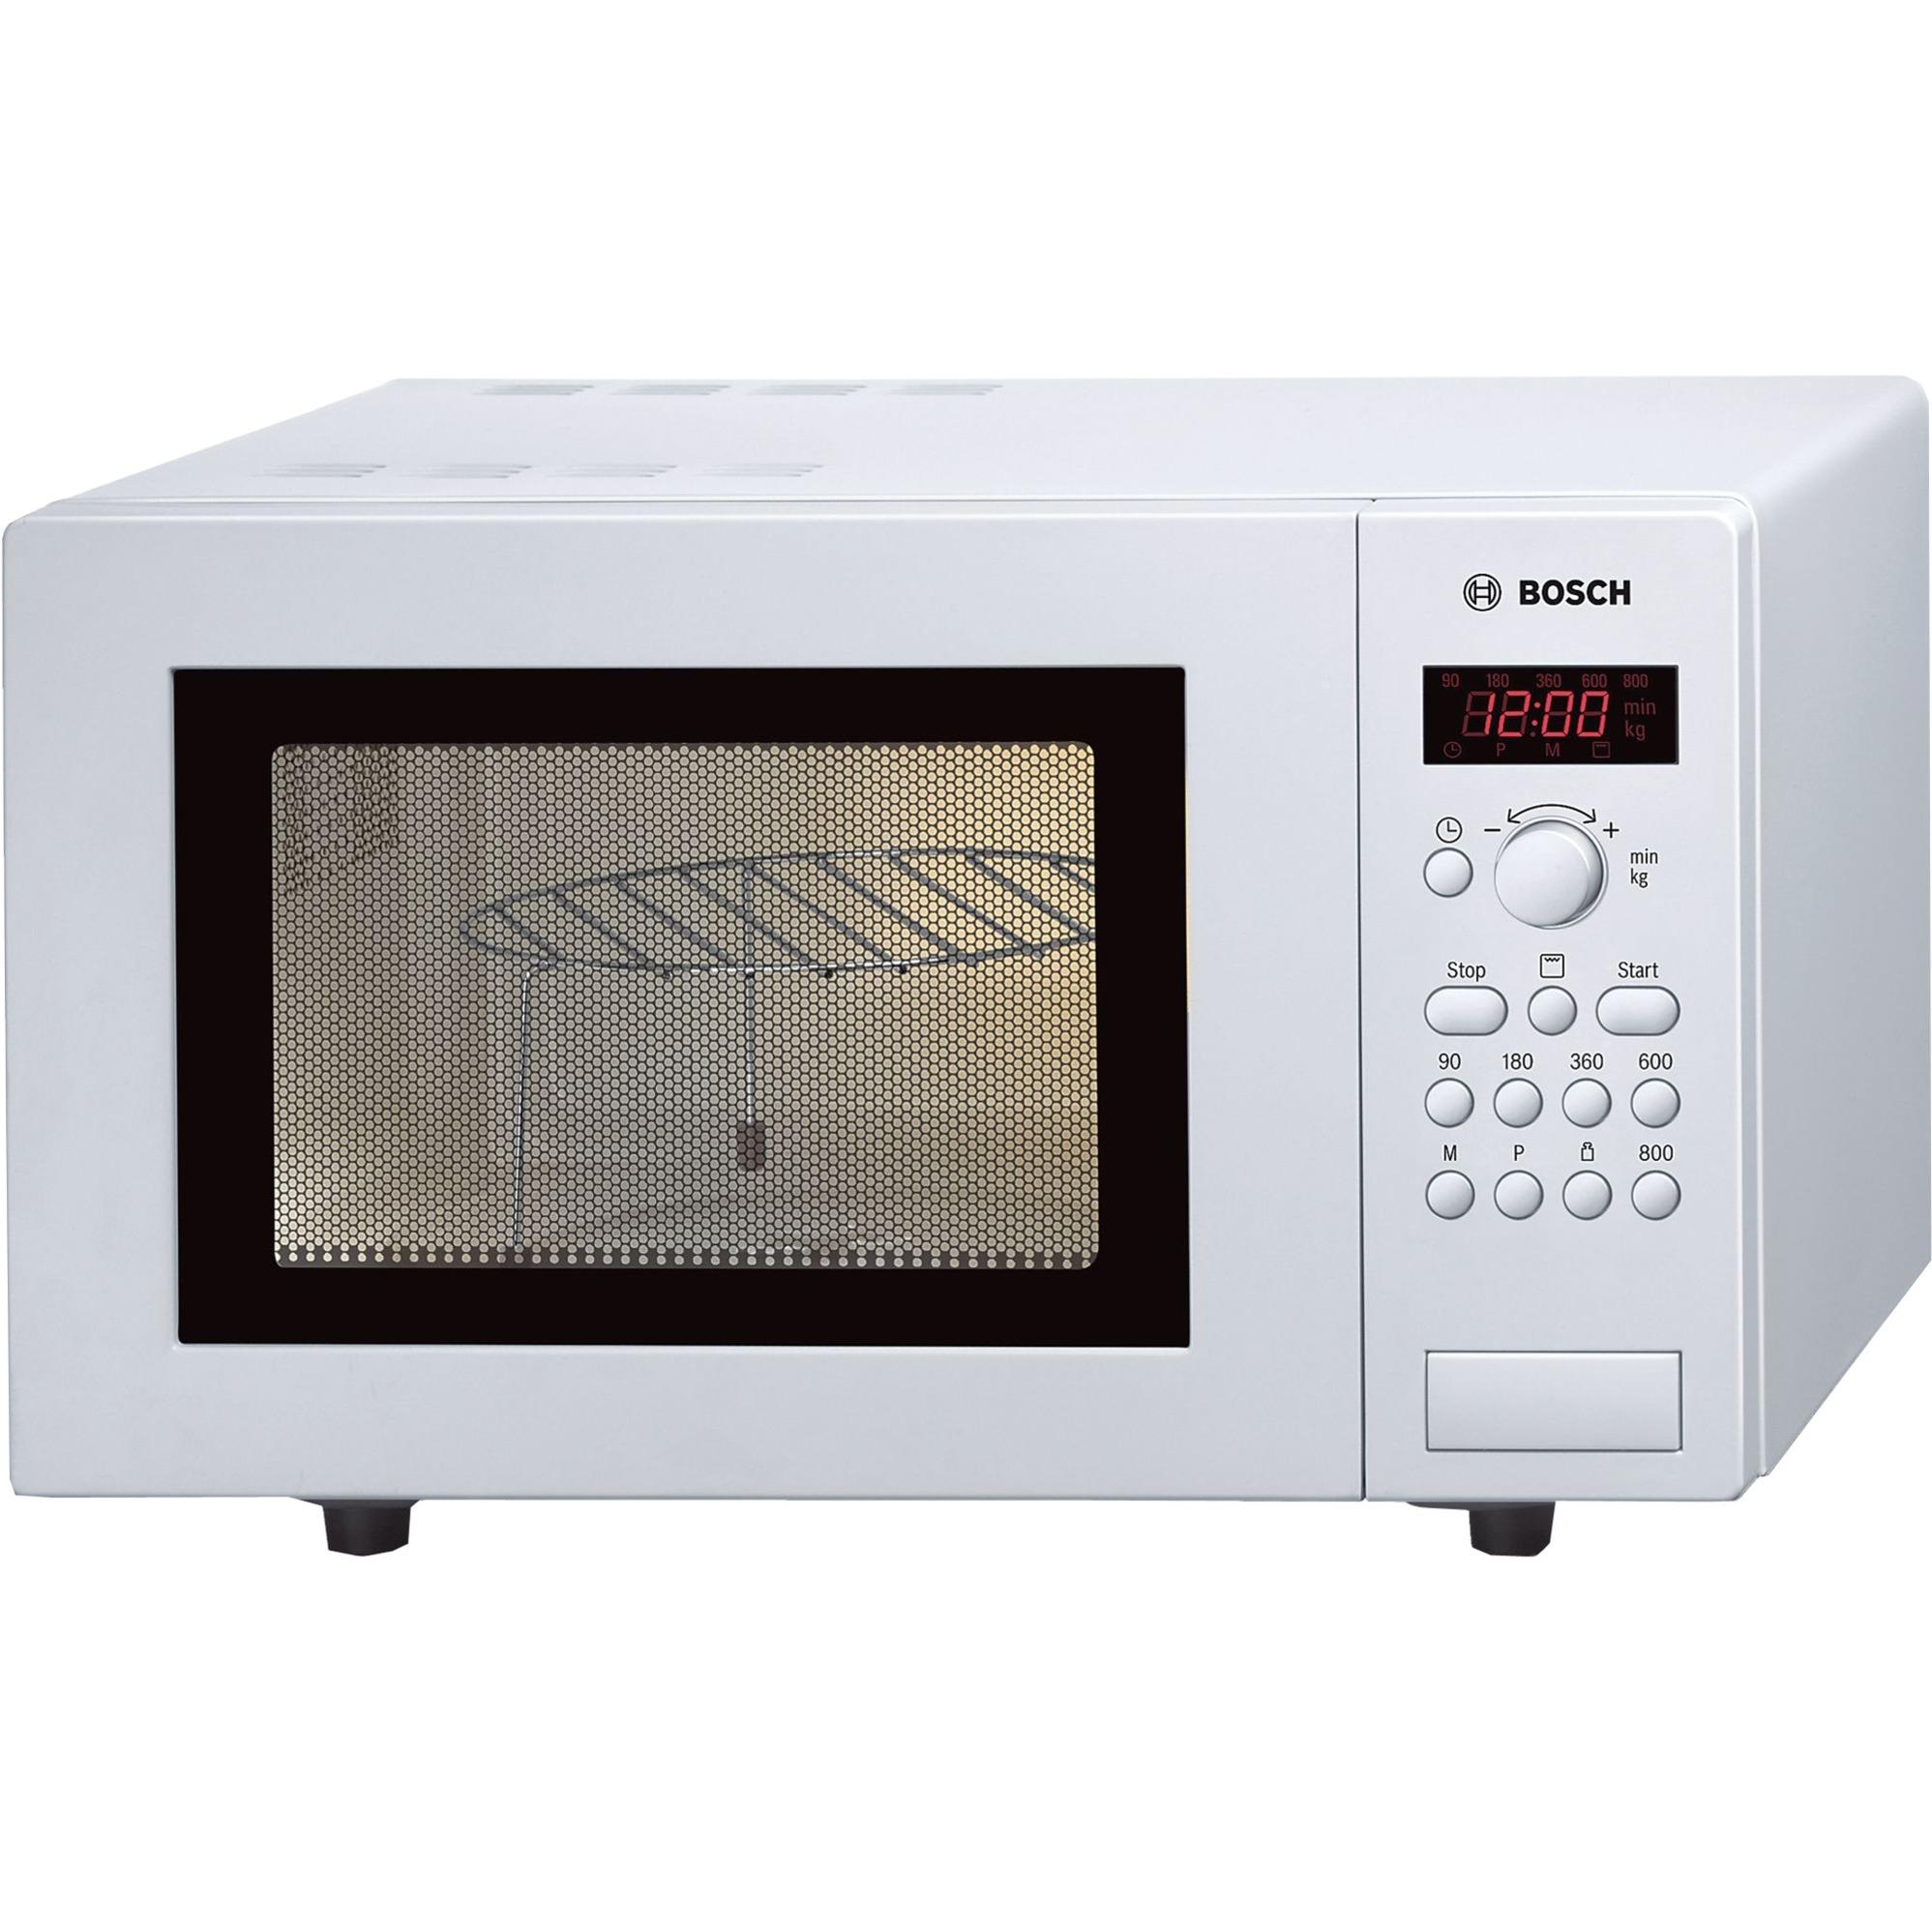 HMT75G421 17L 800W Blanc micro-onde, Four à micro-ondes